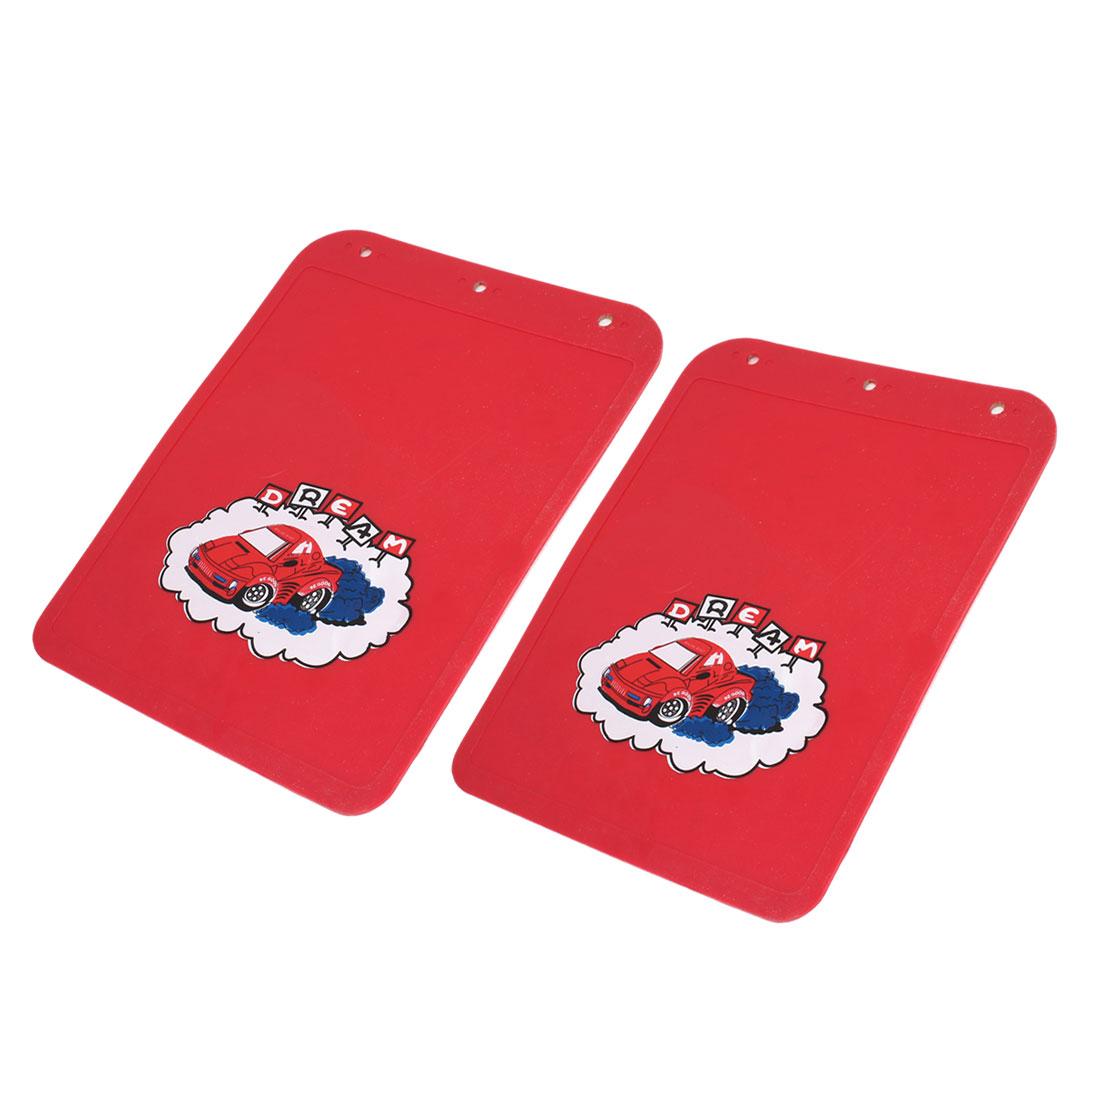 2 Pcs Car Pattern Rubber Splash Mudguard Red 32cm x 24cm